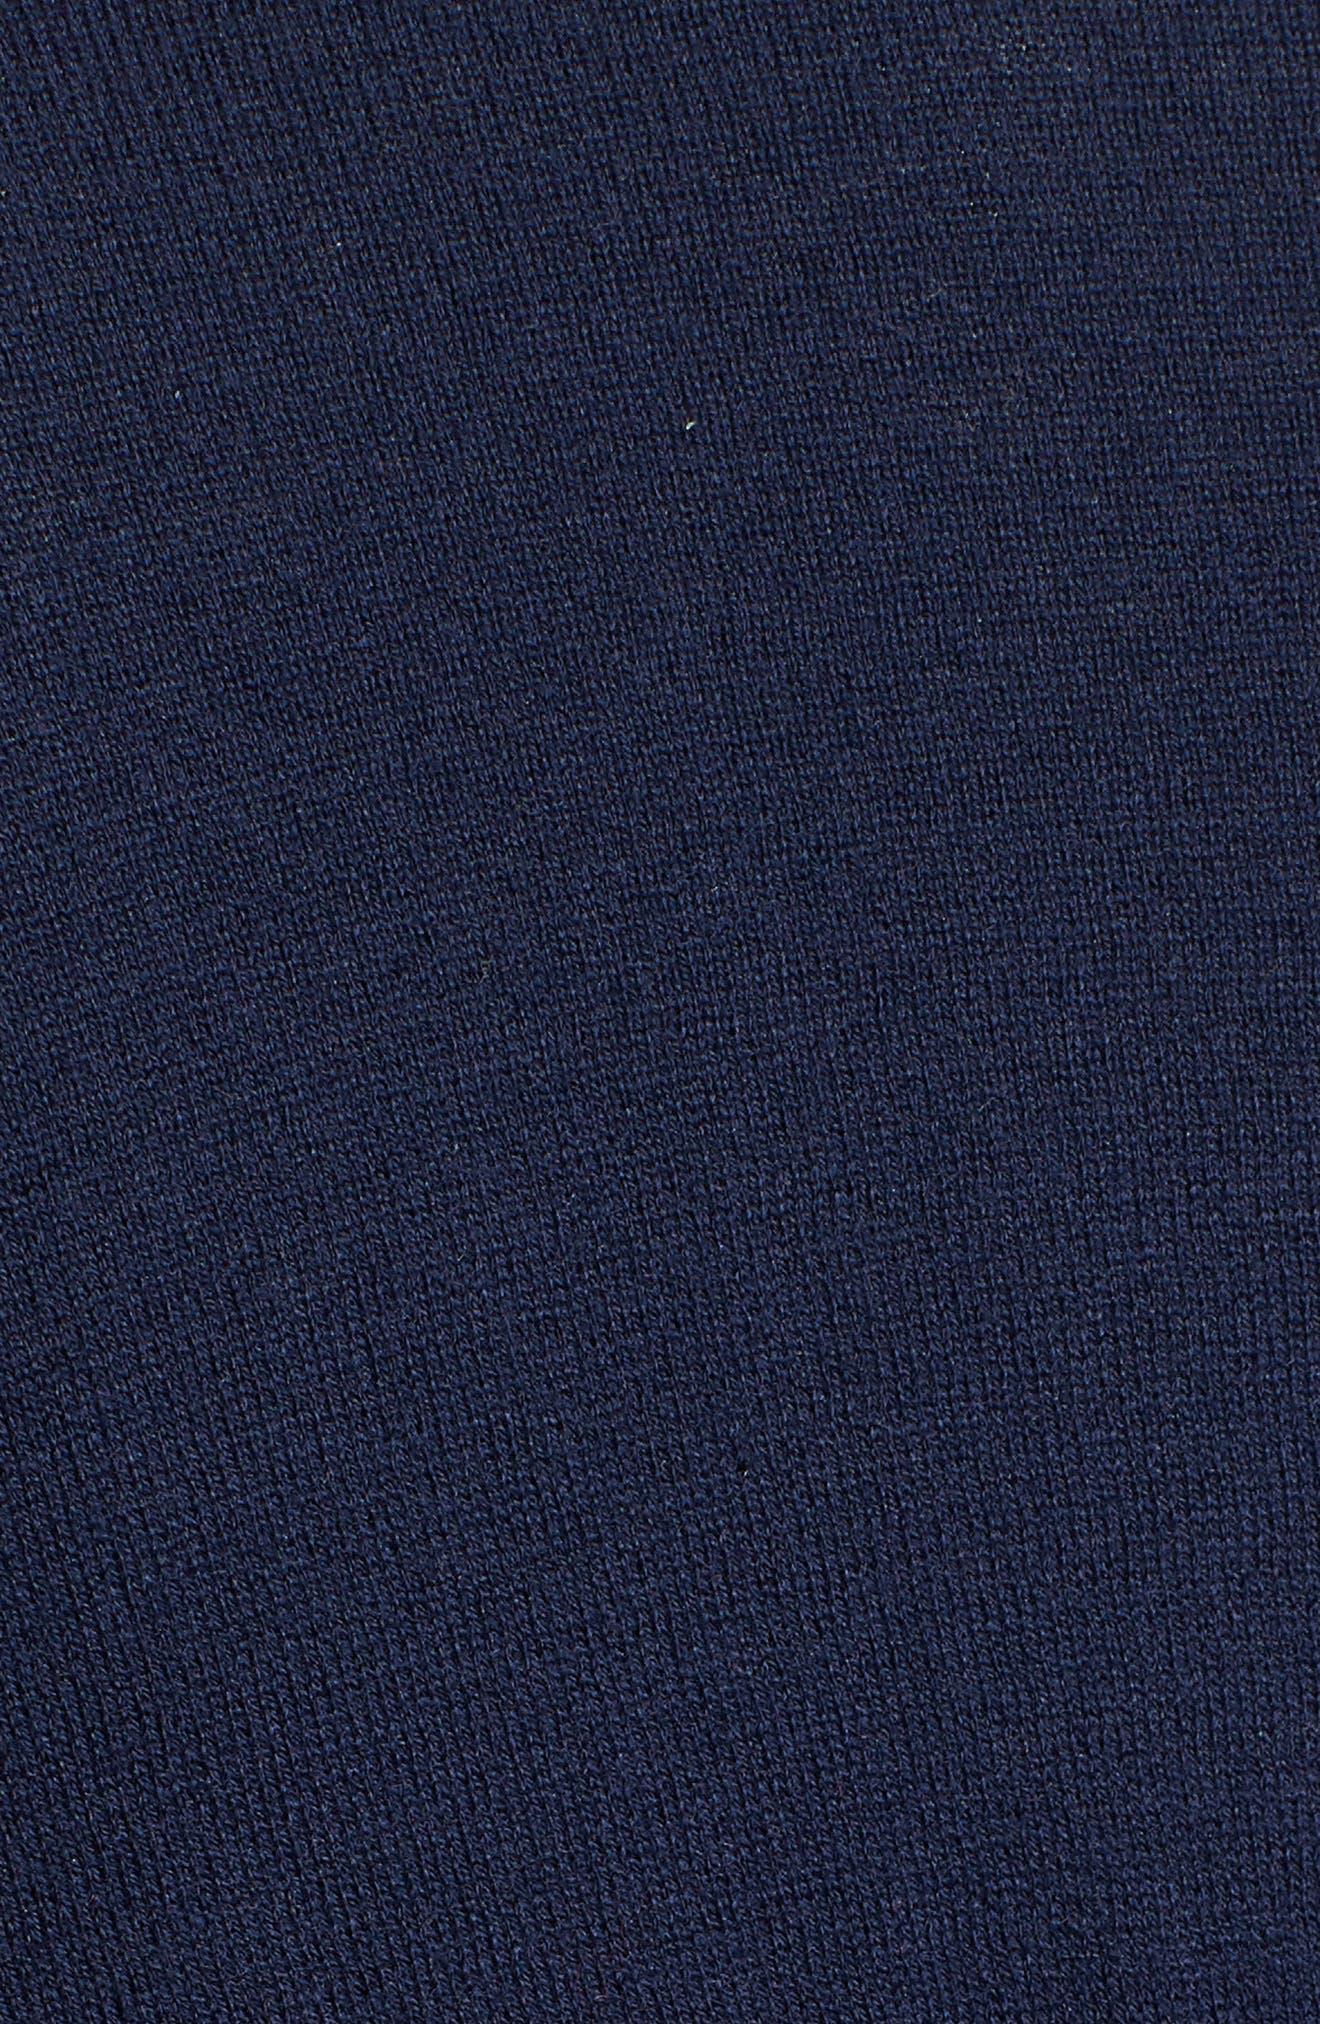 Lightweight Cardigan,                             Alternate thumbnail 6, color,                             Navy Iris